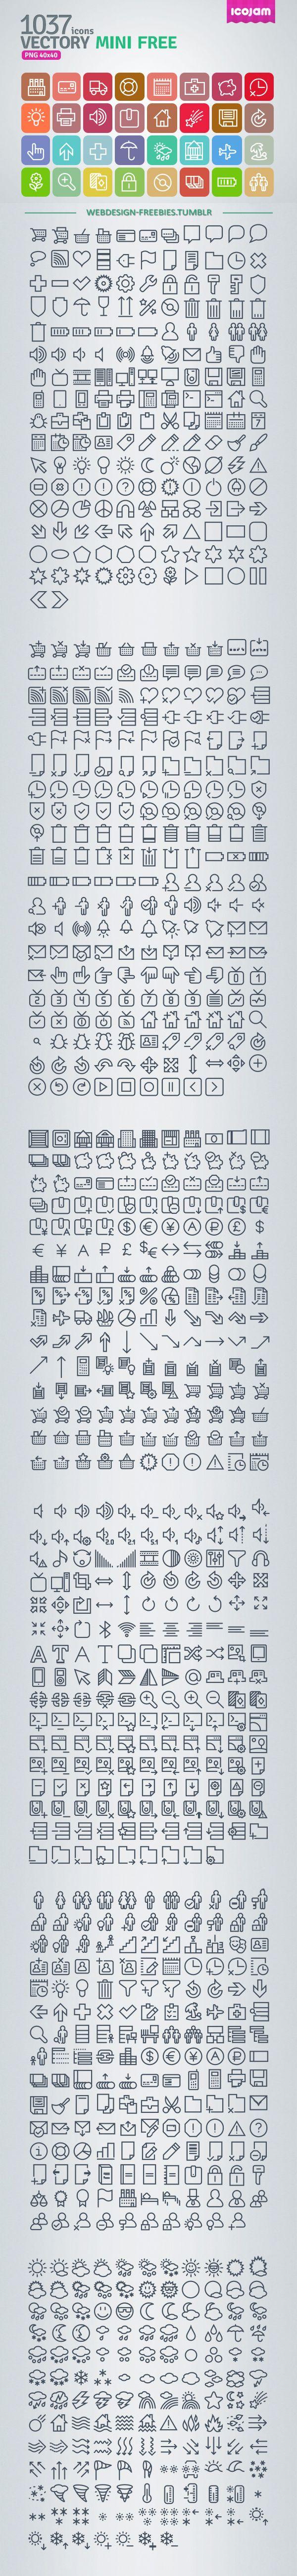 Vectory Mini - 1037 Free Icons